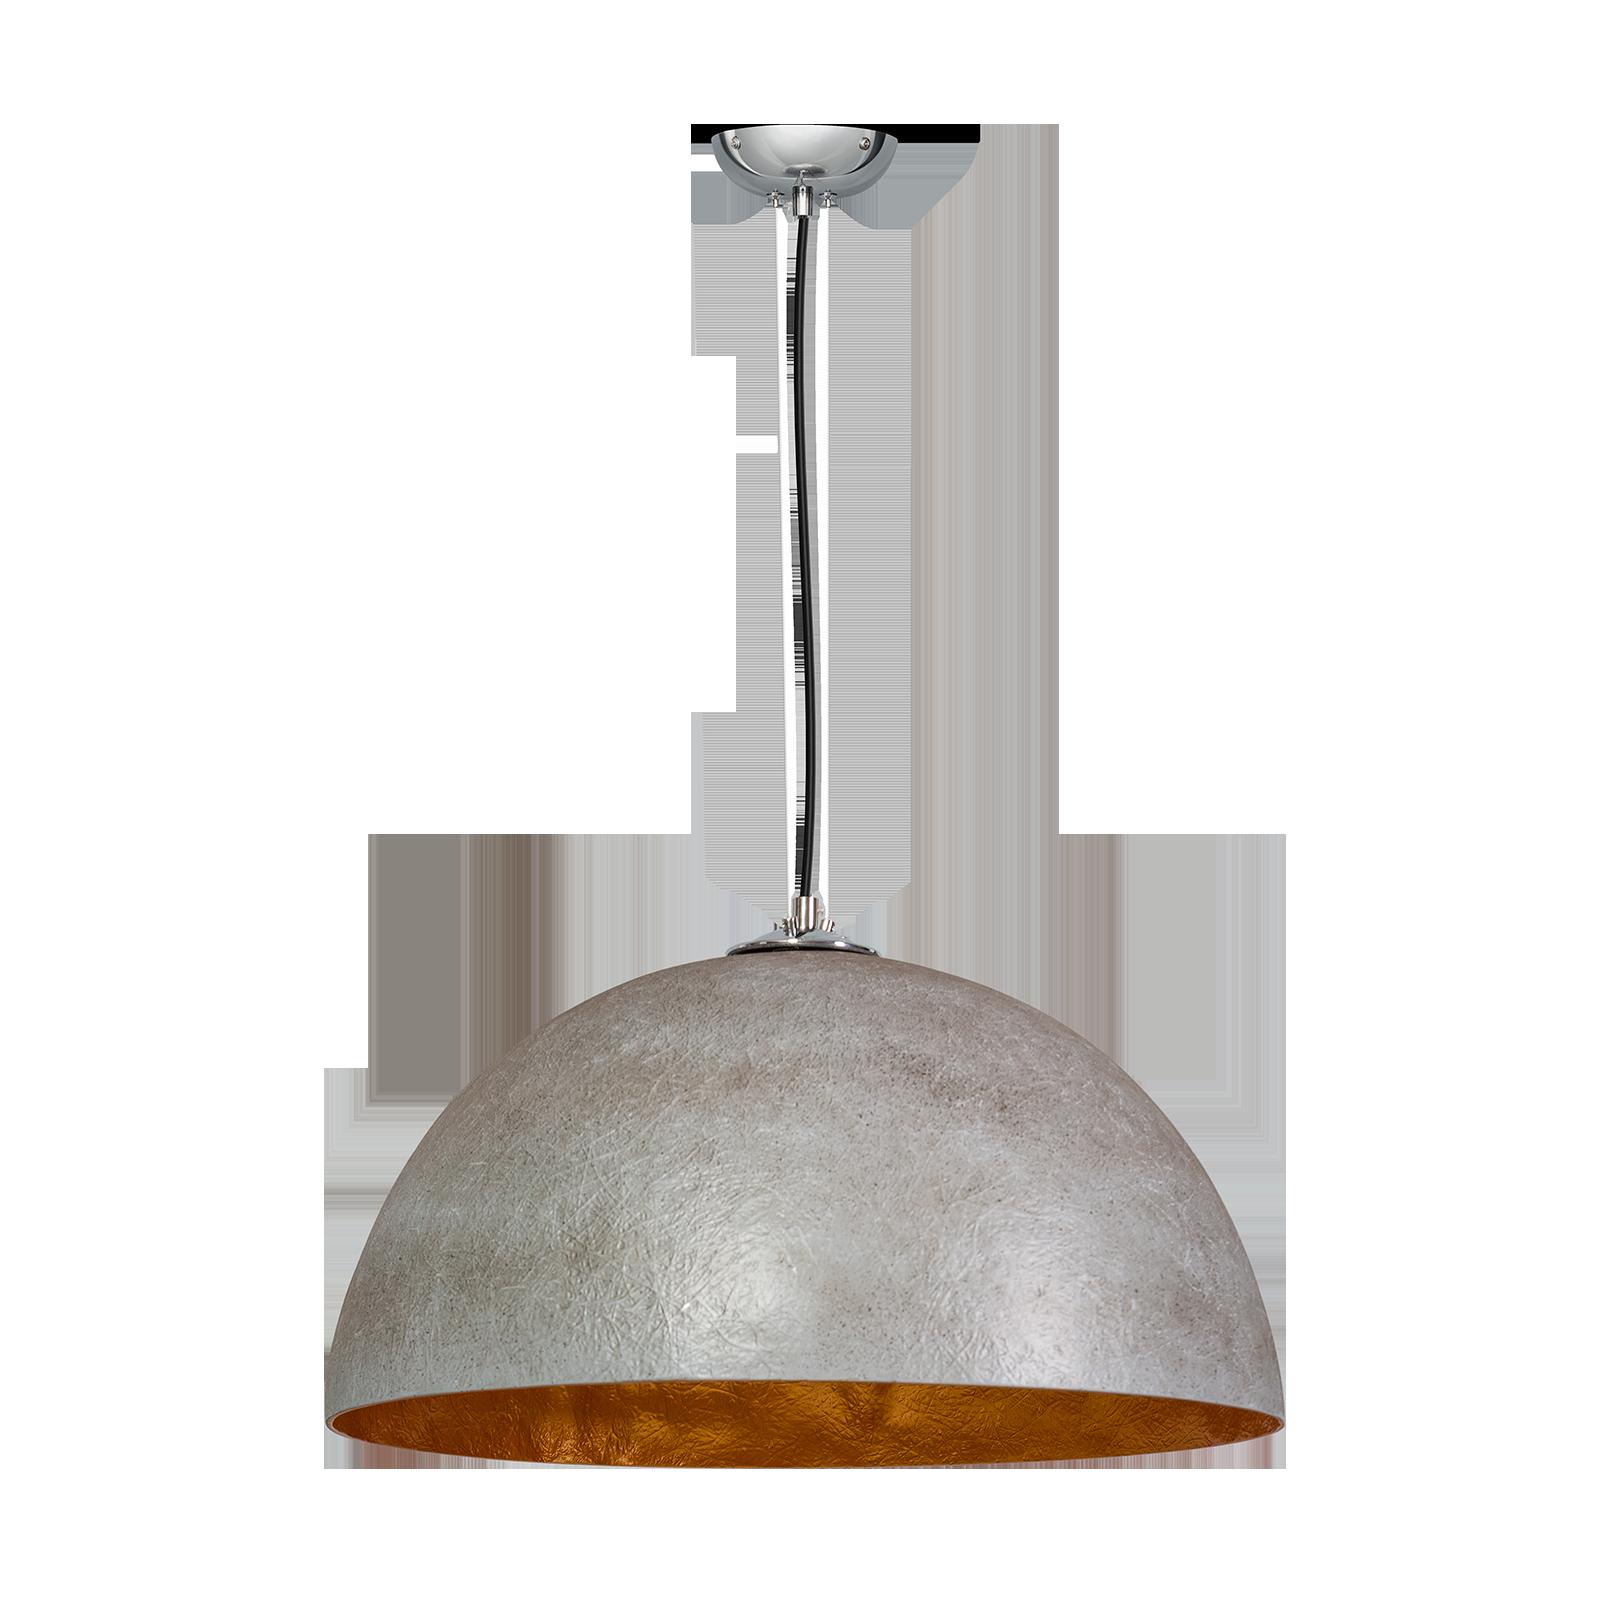 OUTLET - Mezzo Tondo hanglamp ETH betongrijs/goud � 50cm